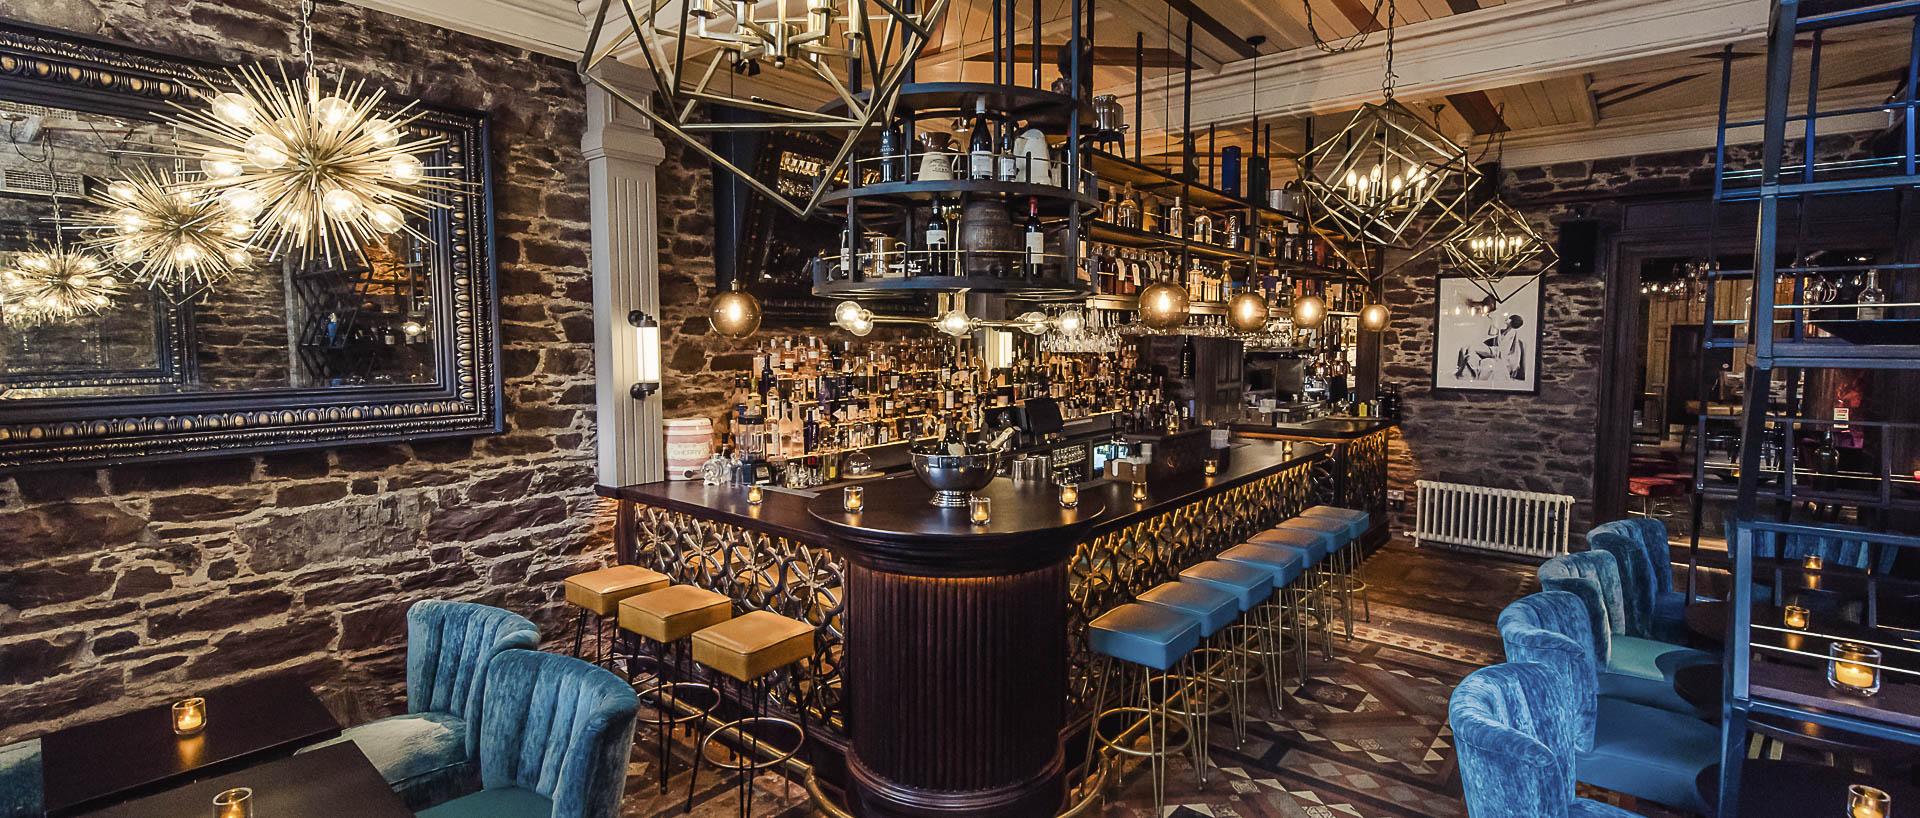 Cocktail bars in Cork